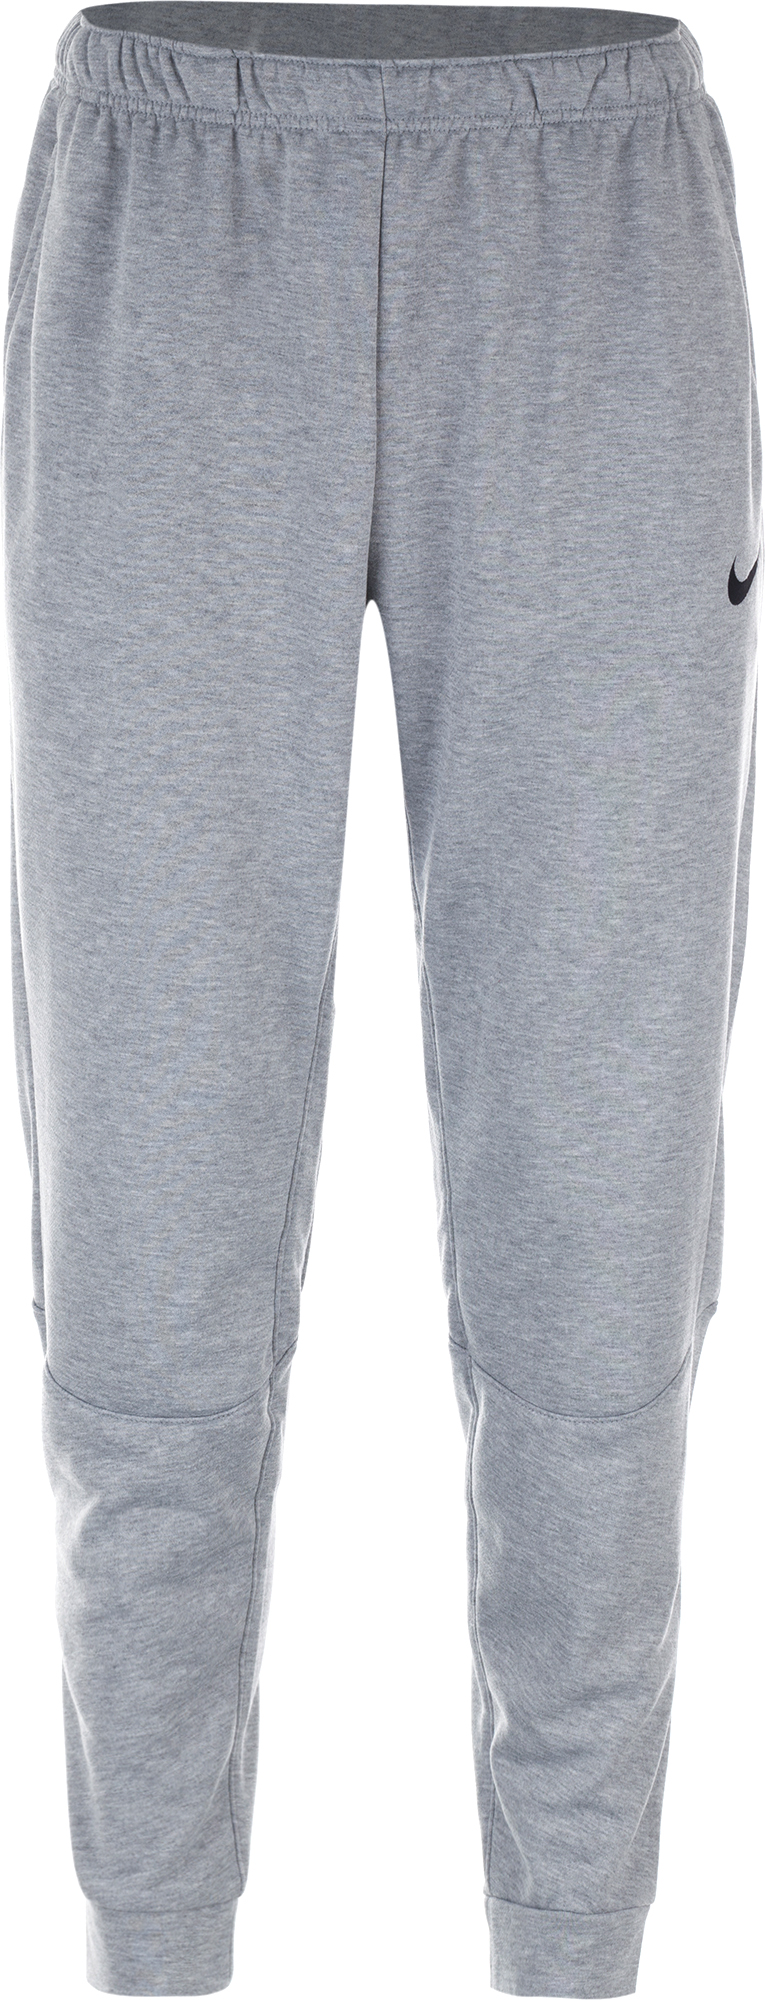 Nike Брюки мужские Nike Dry, размер 52-54 брюки мужские sela цвет темно серый меланж pk 2415 012 8310 размер xxl 54